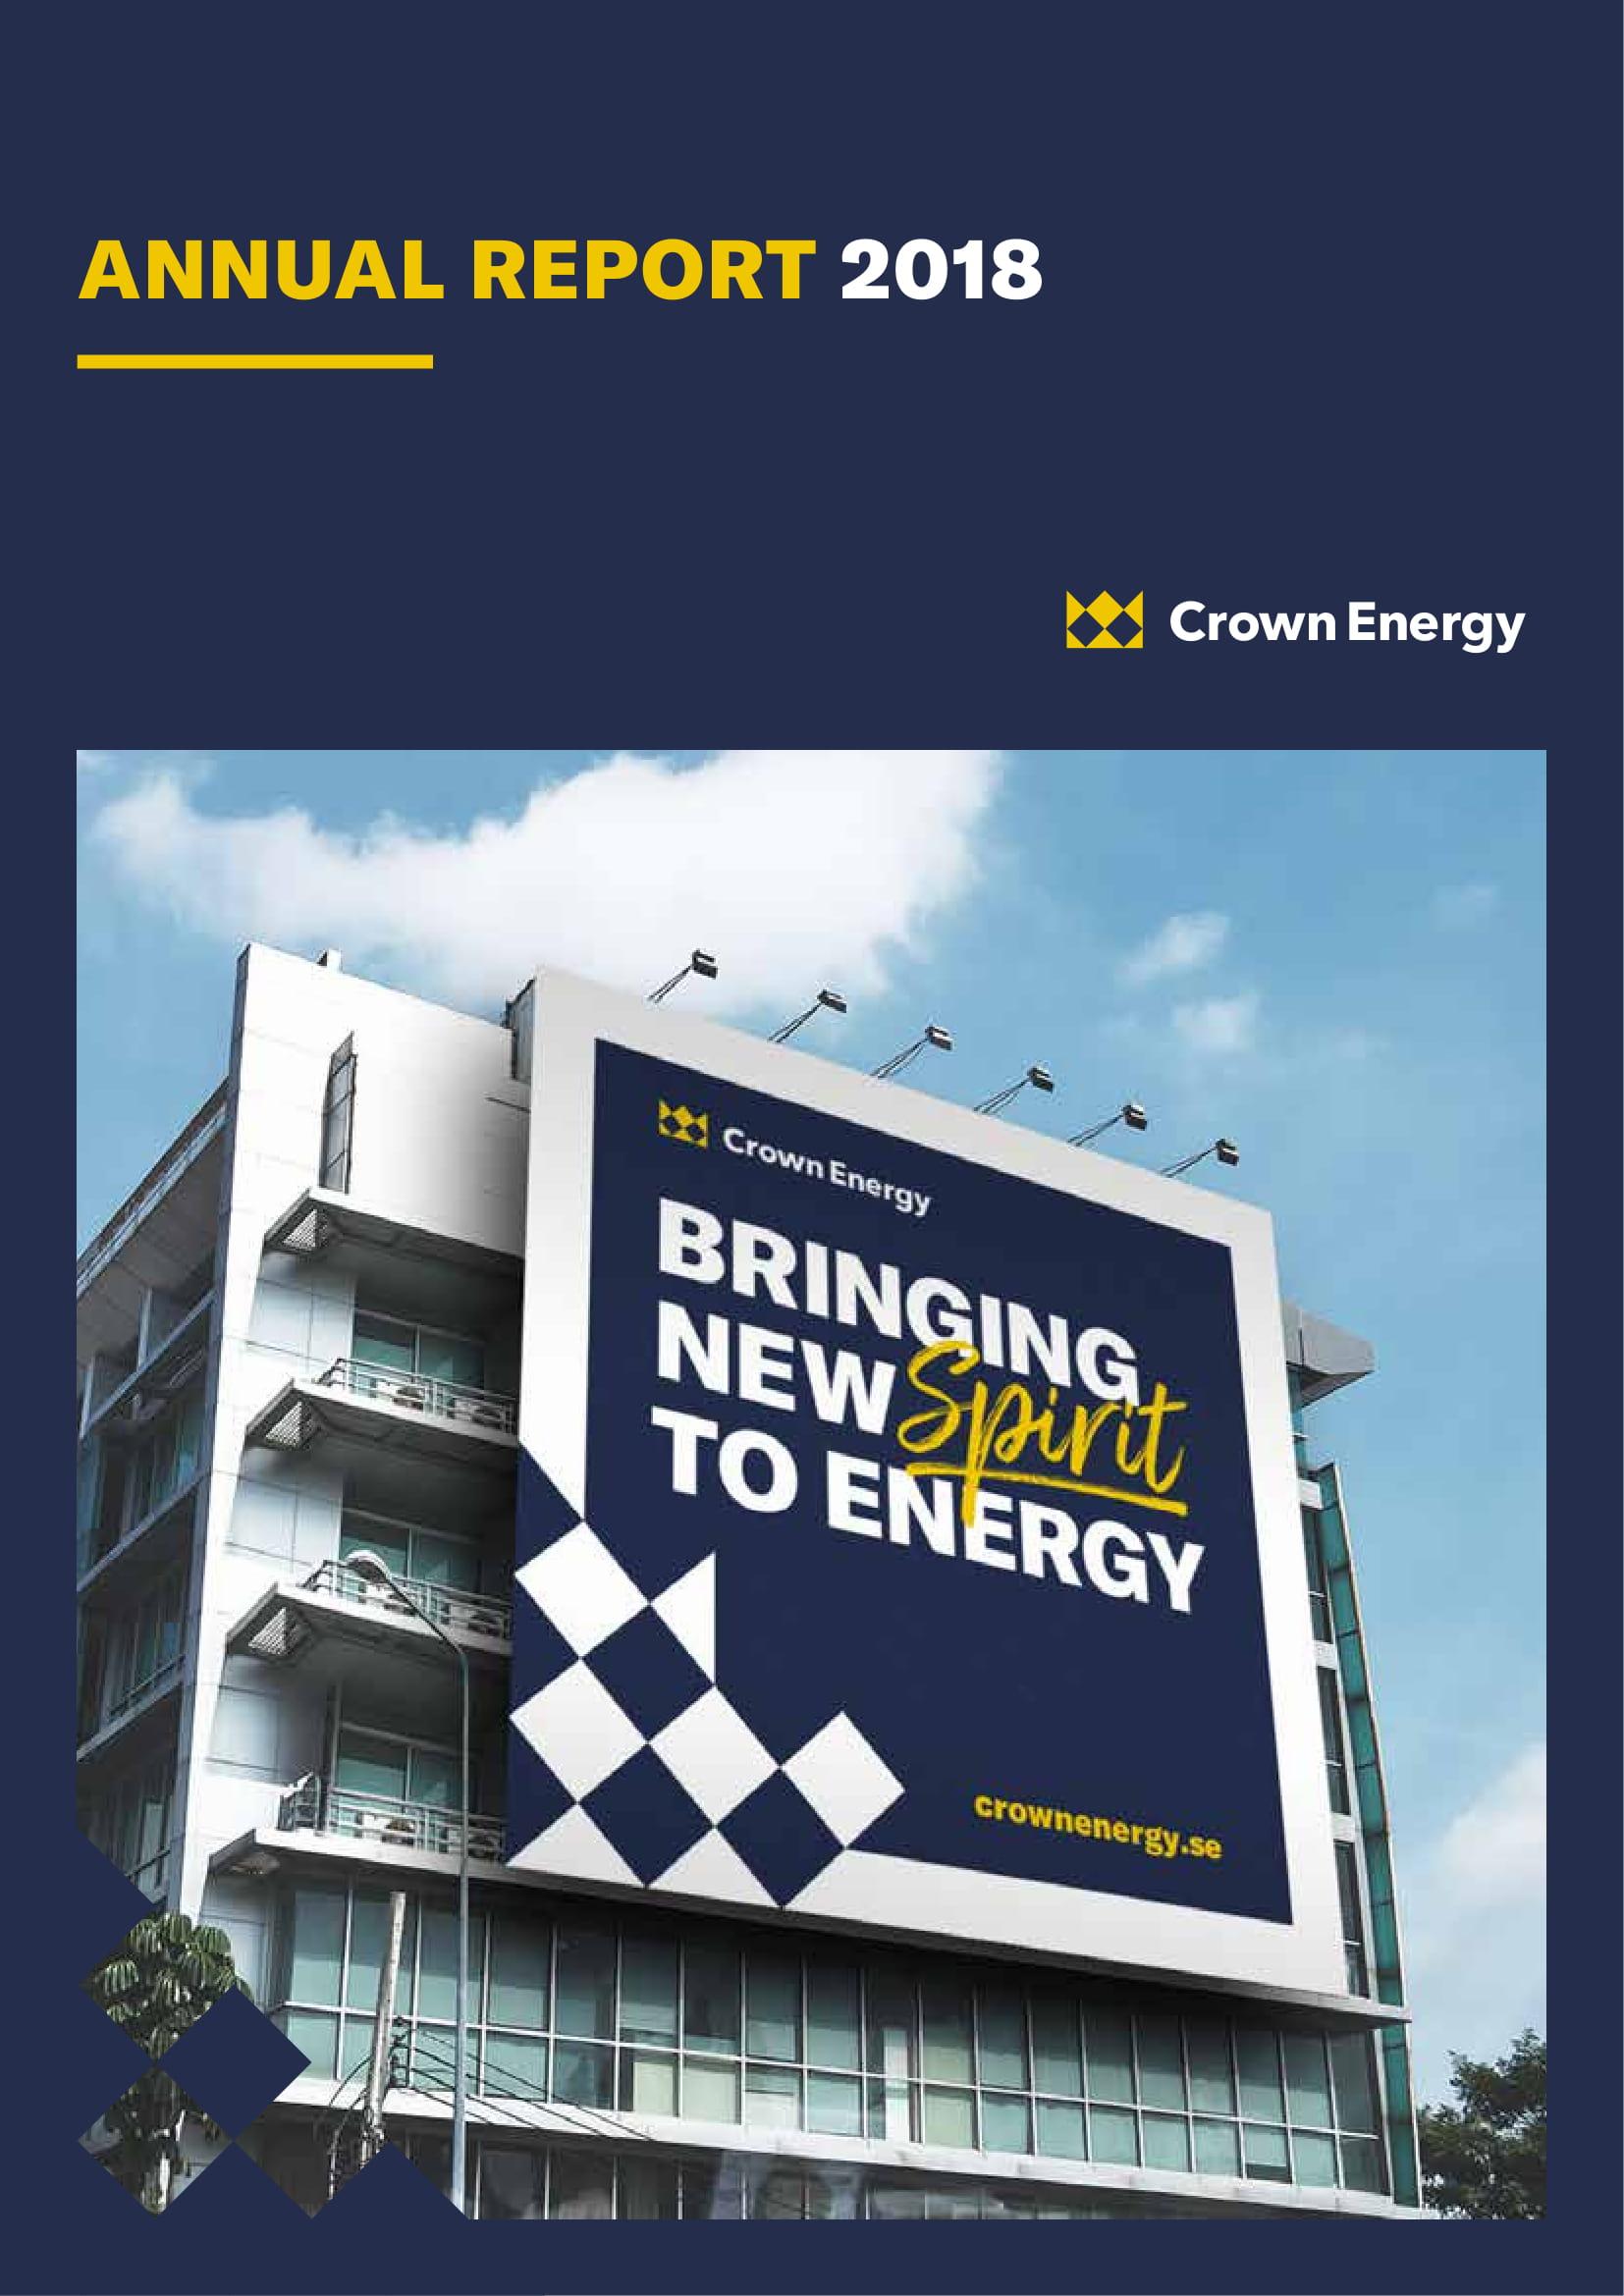 arsredovisning_crown_energy_ab_2018_eng-01.jpg